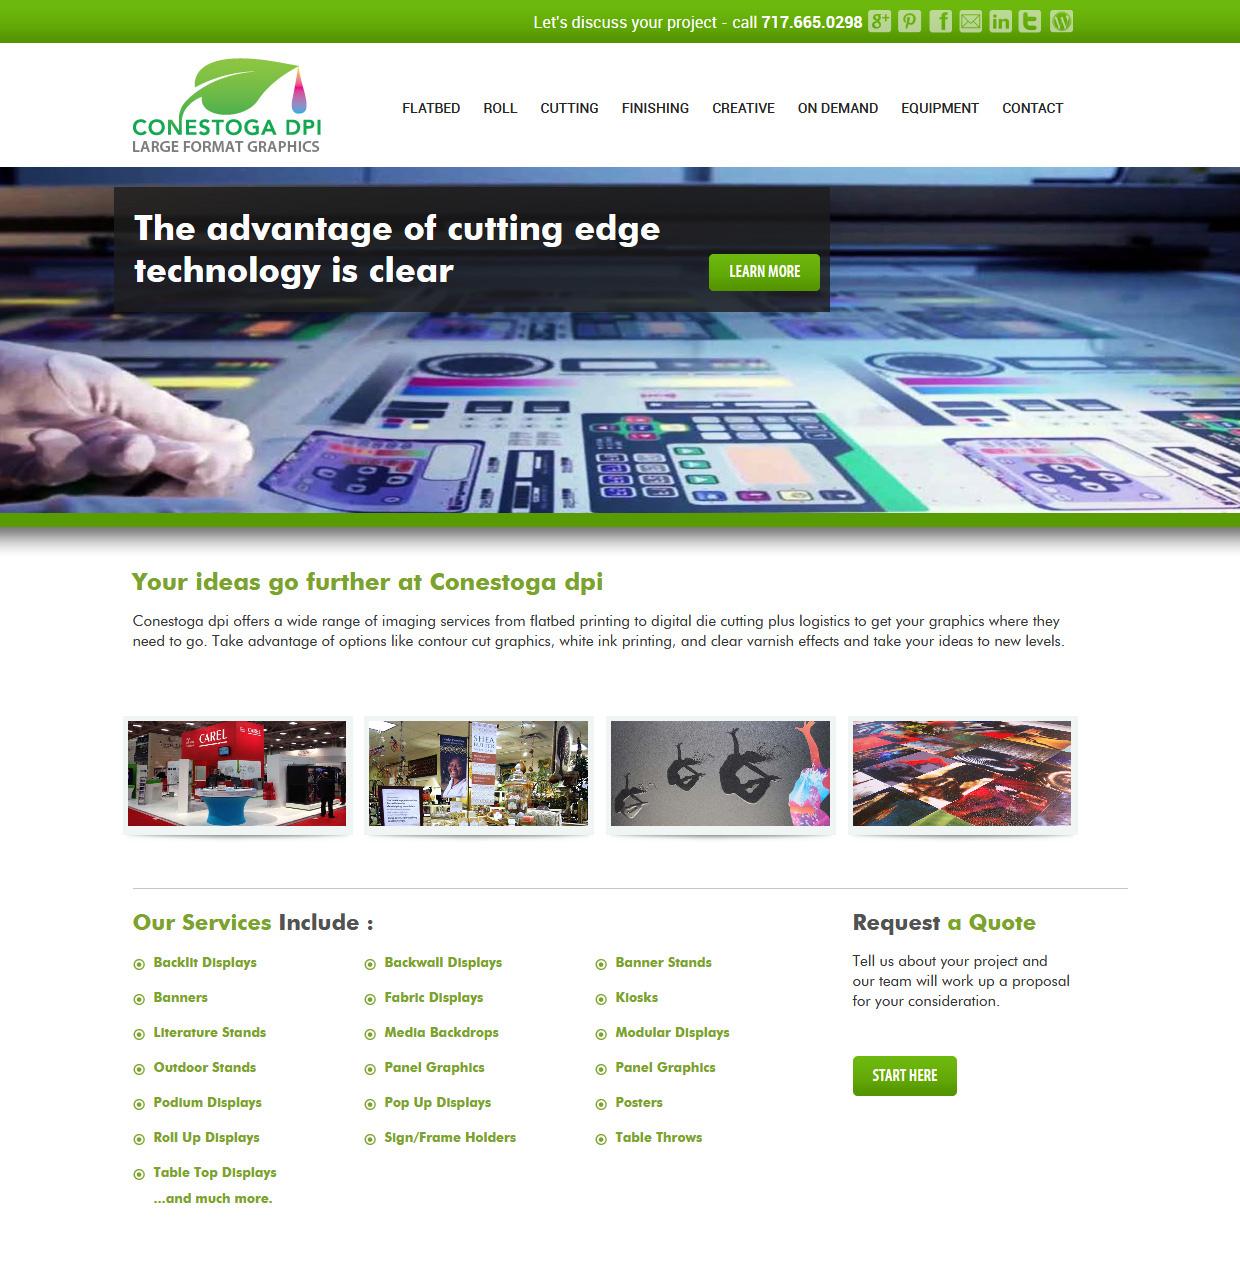 Conestoga DPI large format printer website design